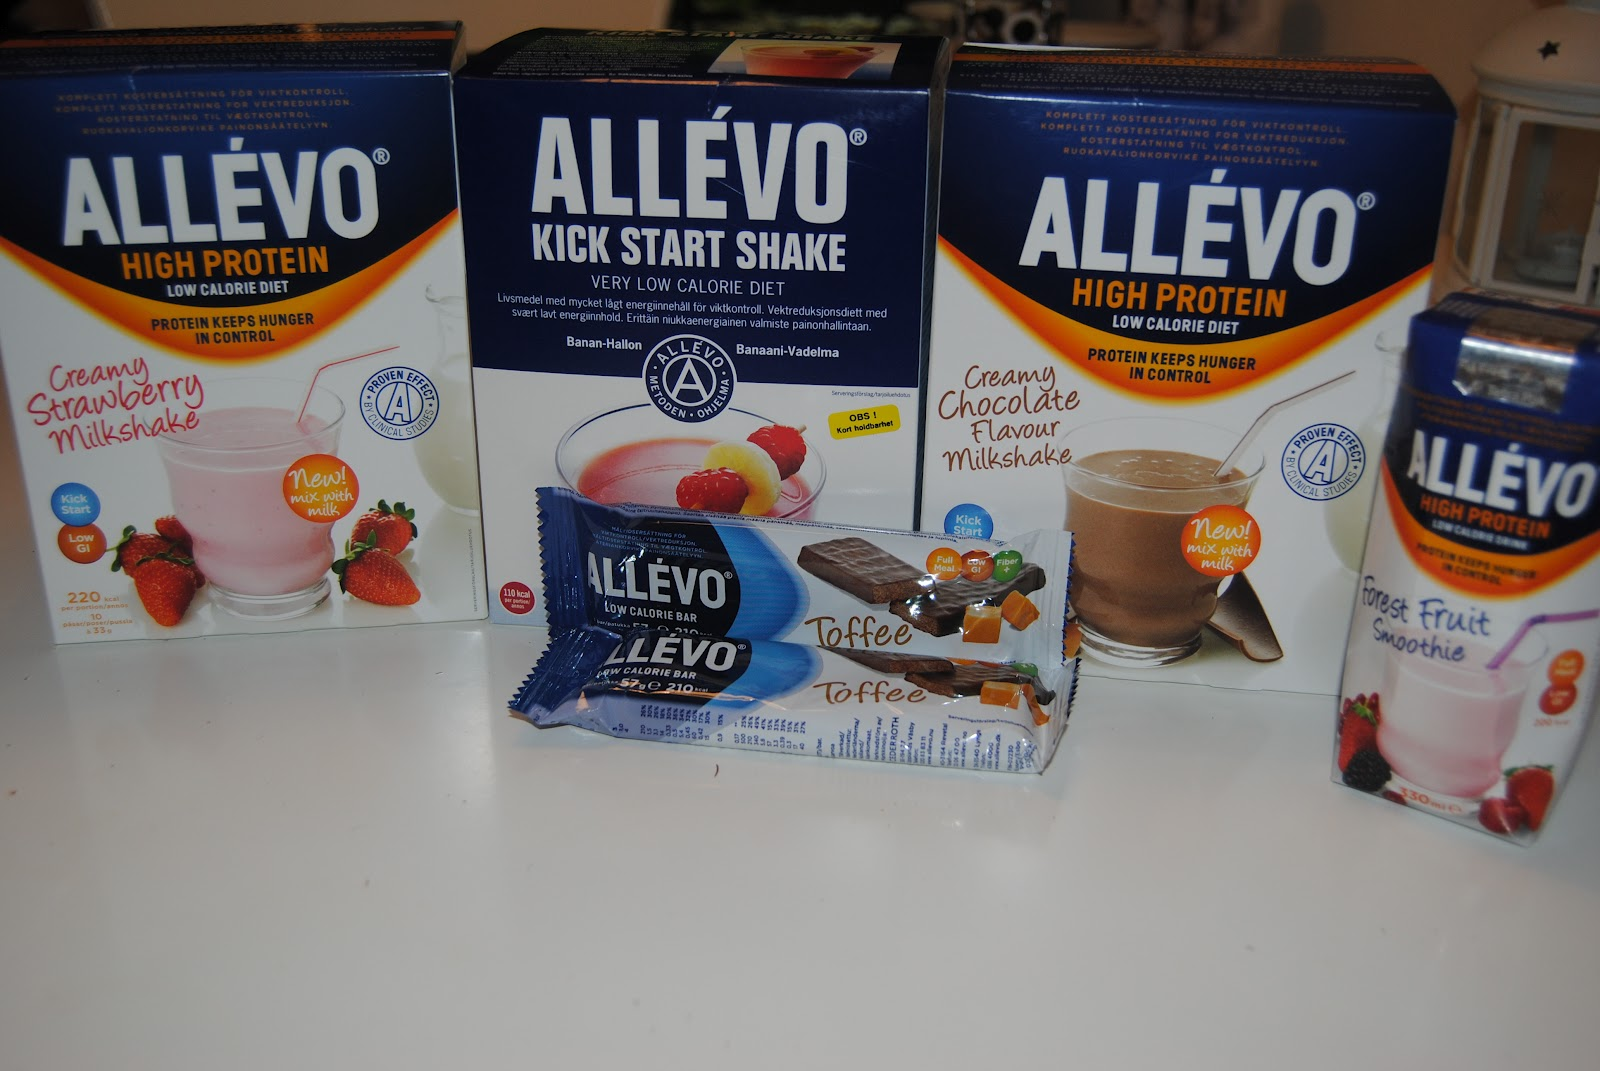 allevo high protein milkshake